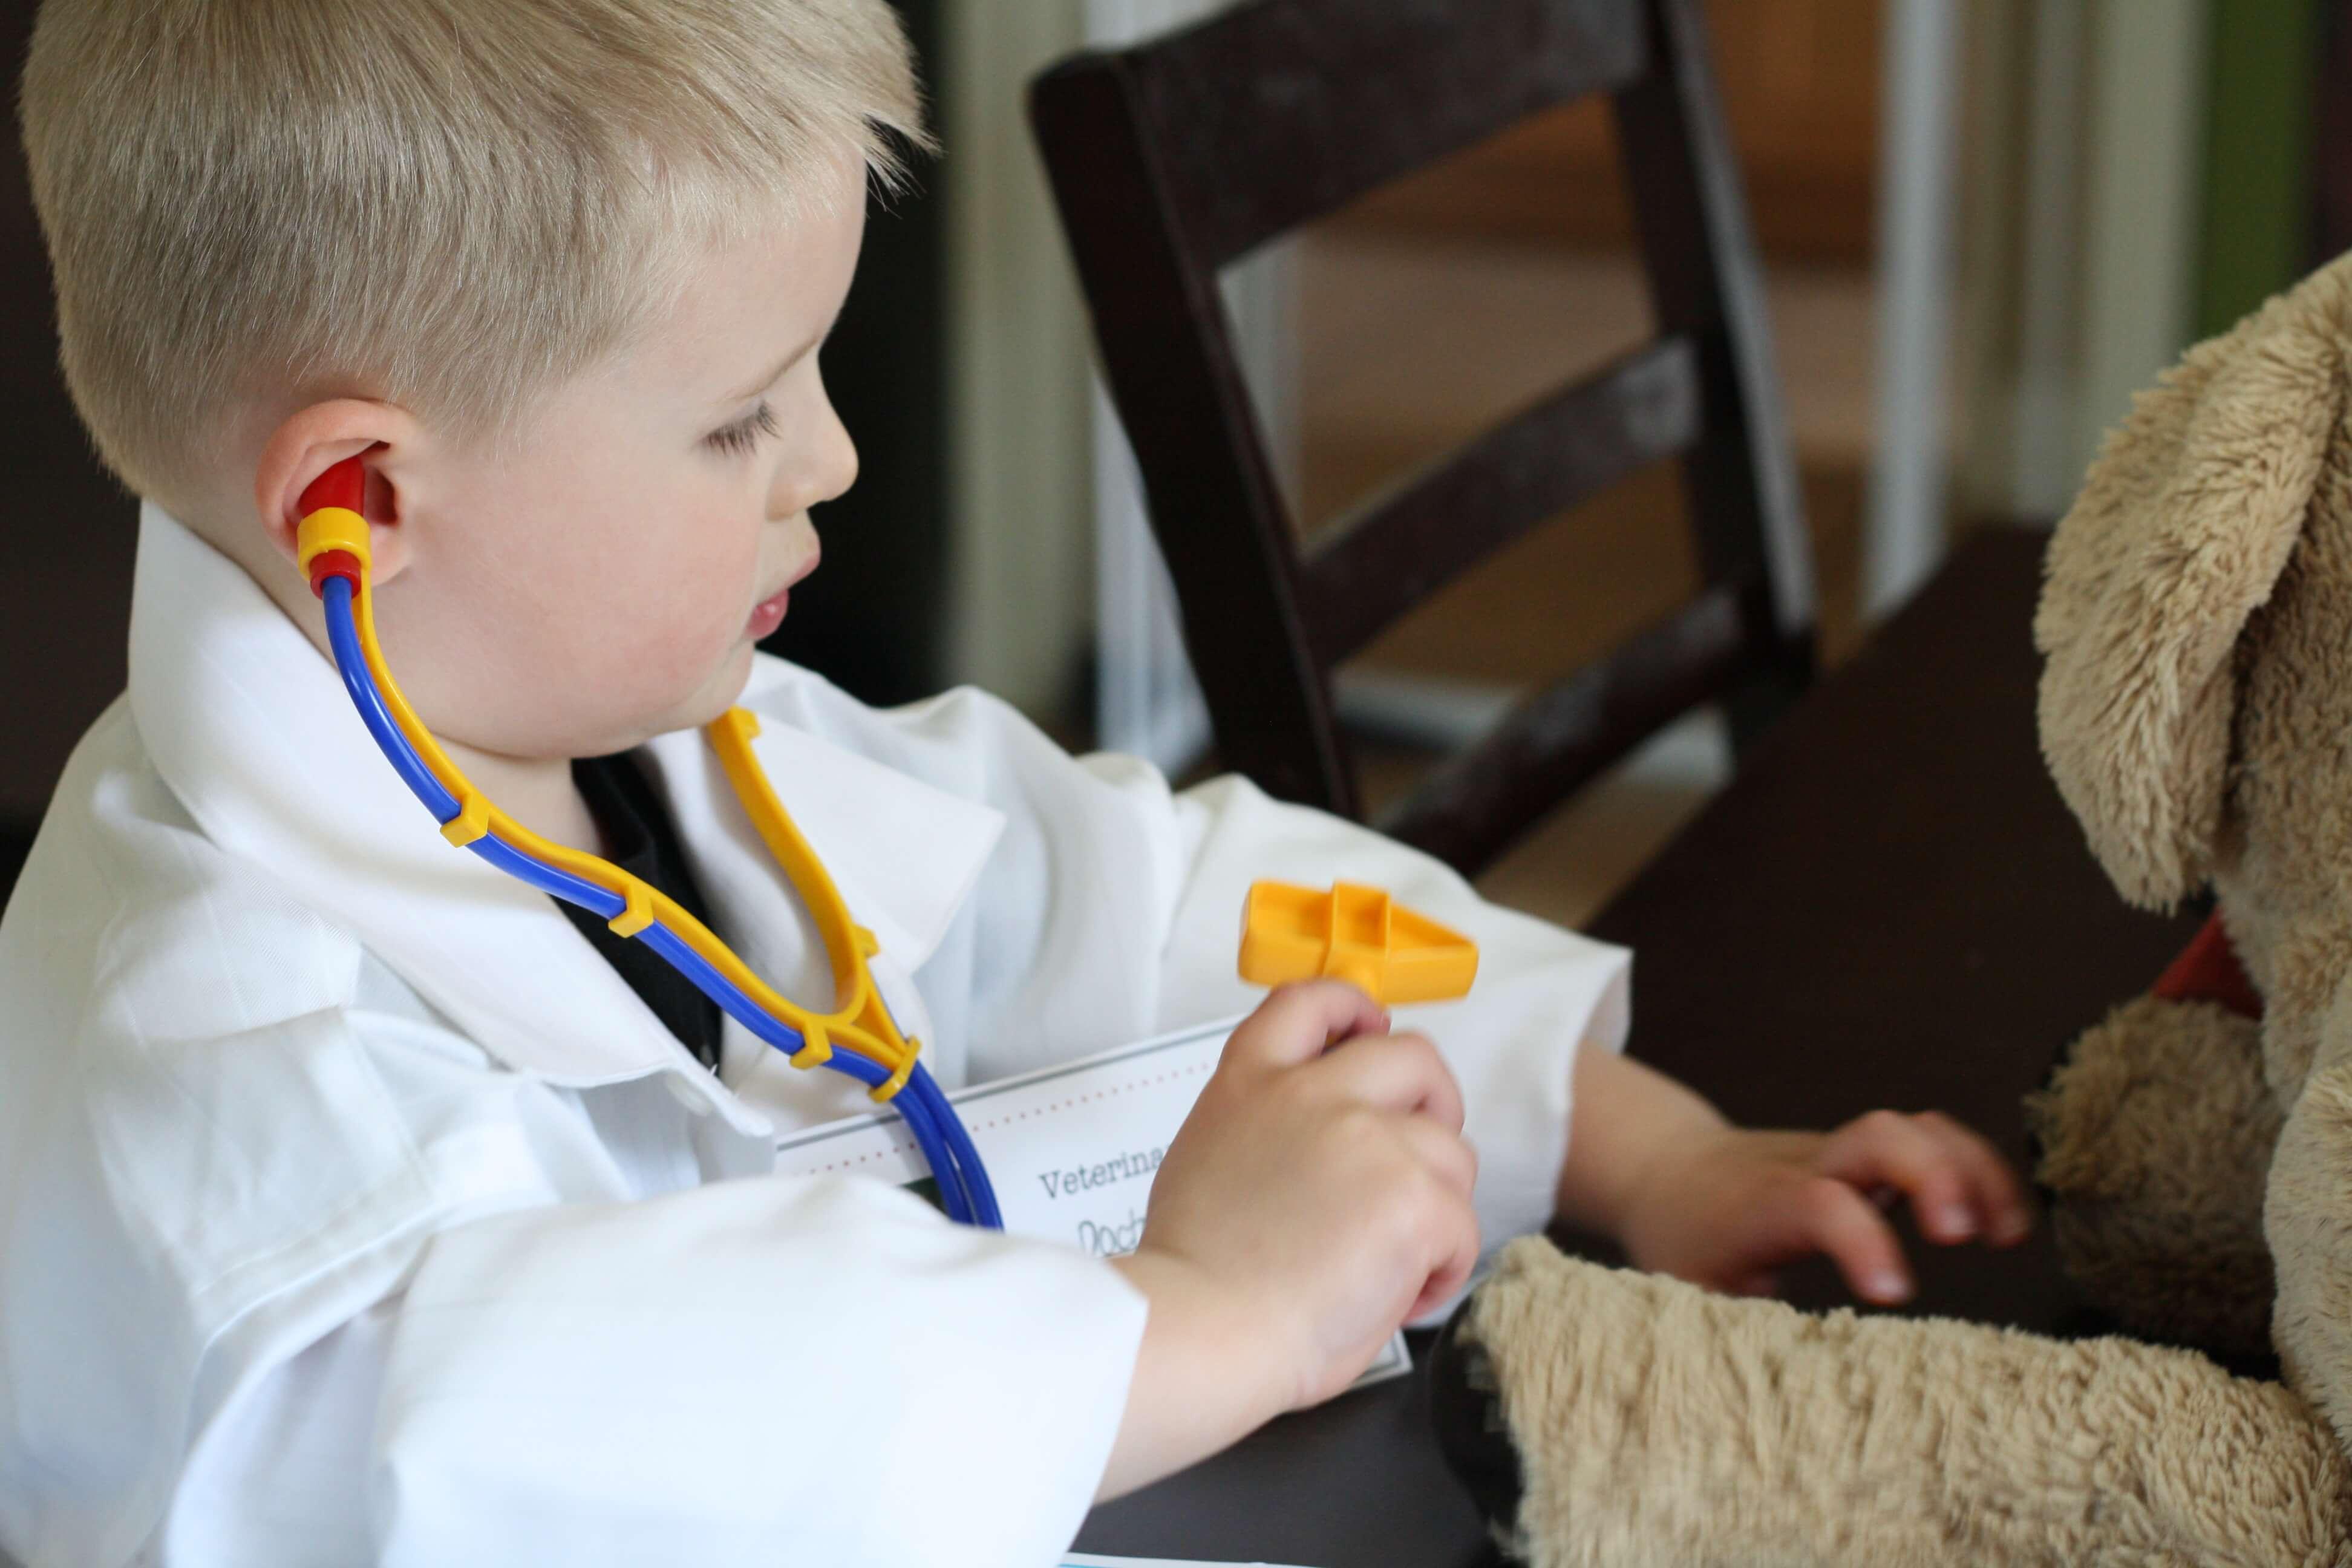 veterinar kid Pretend Play: Veterinarian's Office Printables